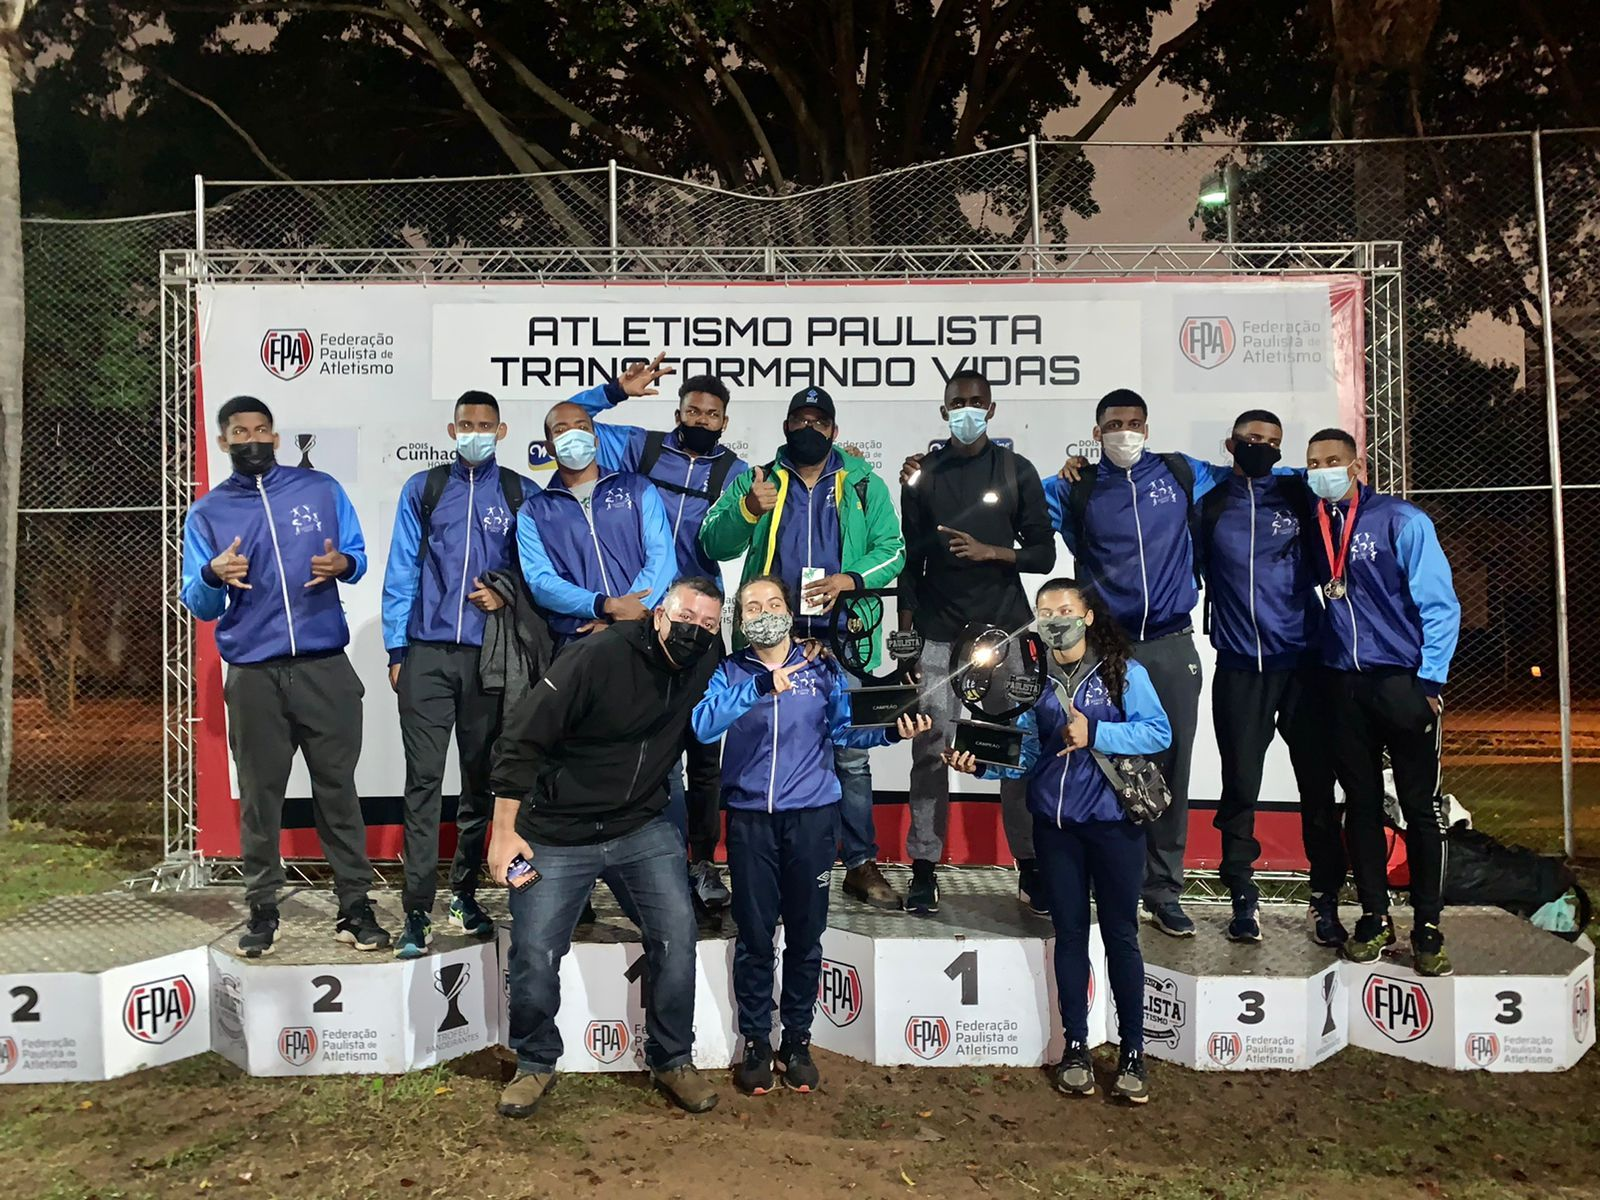 Campeonato Paulista Sub-23 e Troféu Bandeirantes dia 10